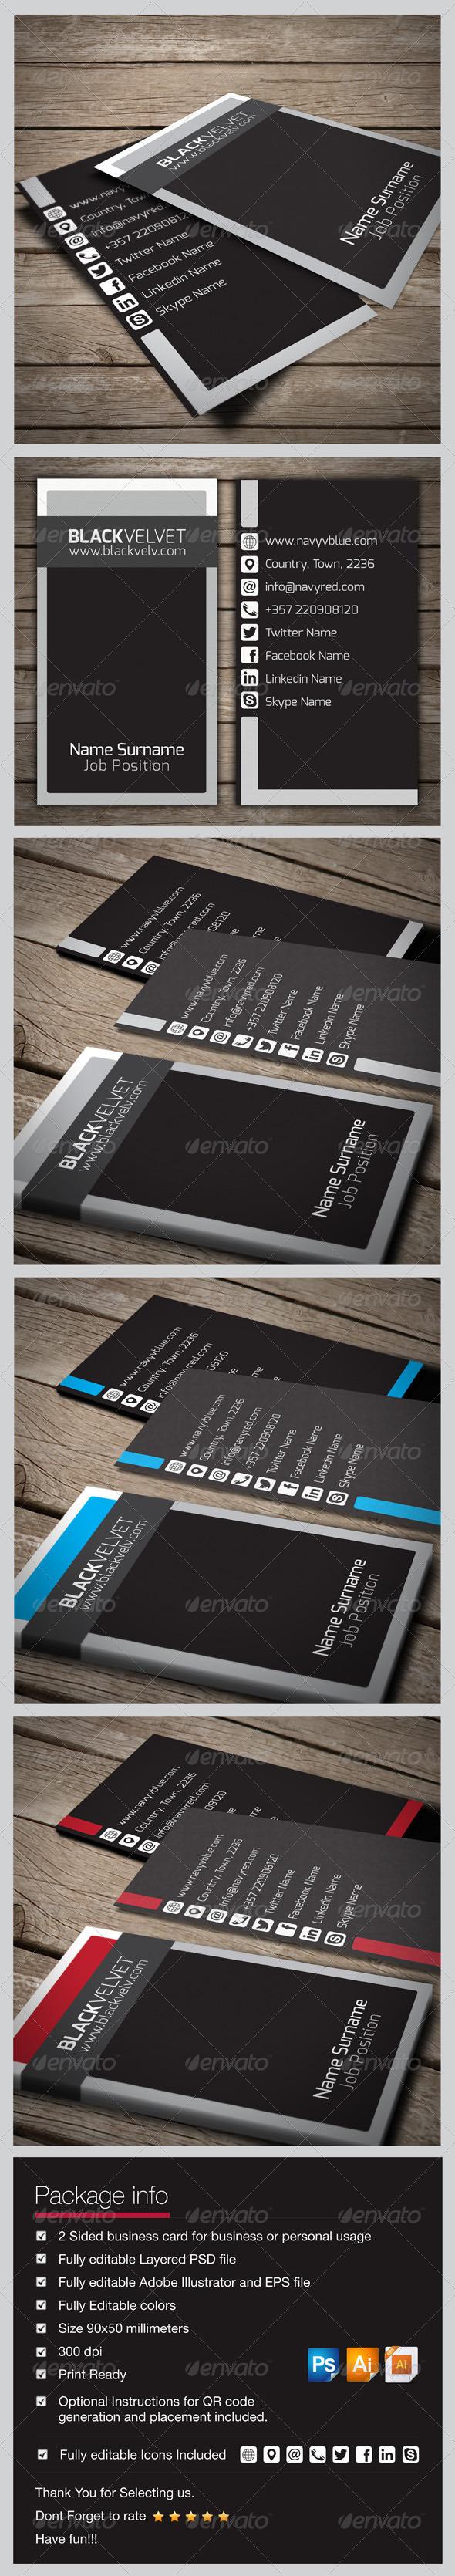 GraphicRiver Black Velvet Business Card 5868726